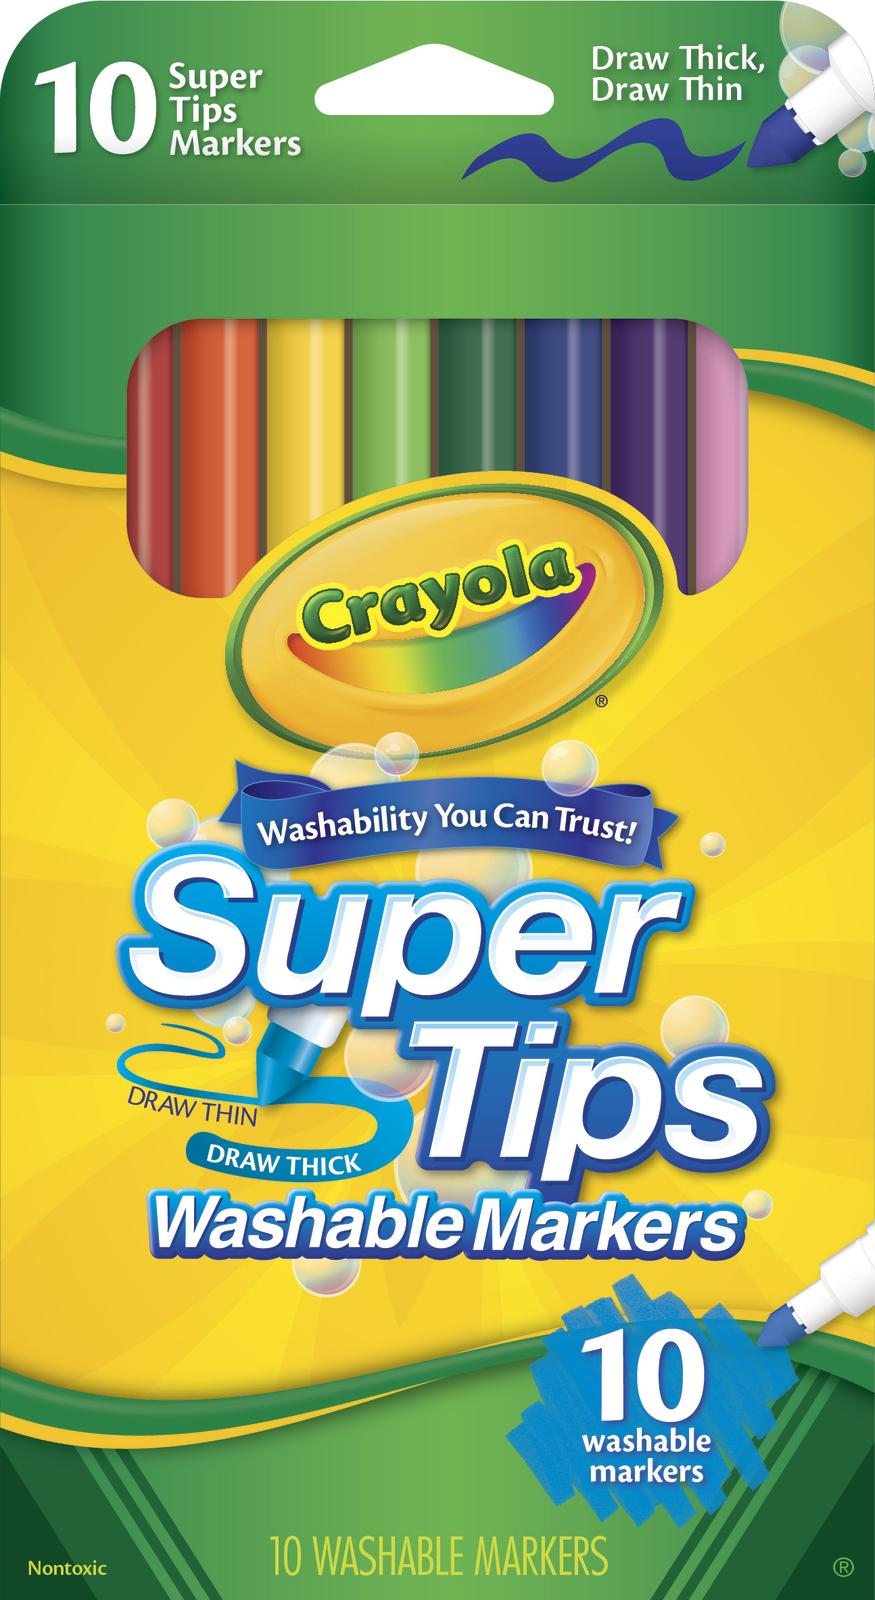 10 Washable Super Tips Markers - Crayola image